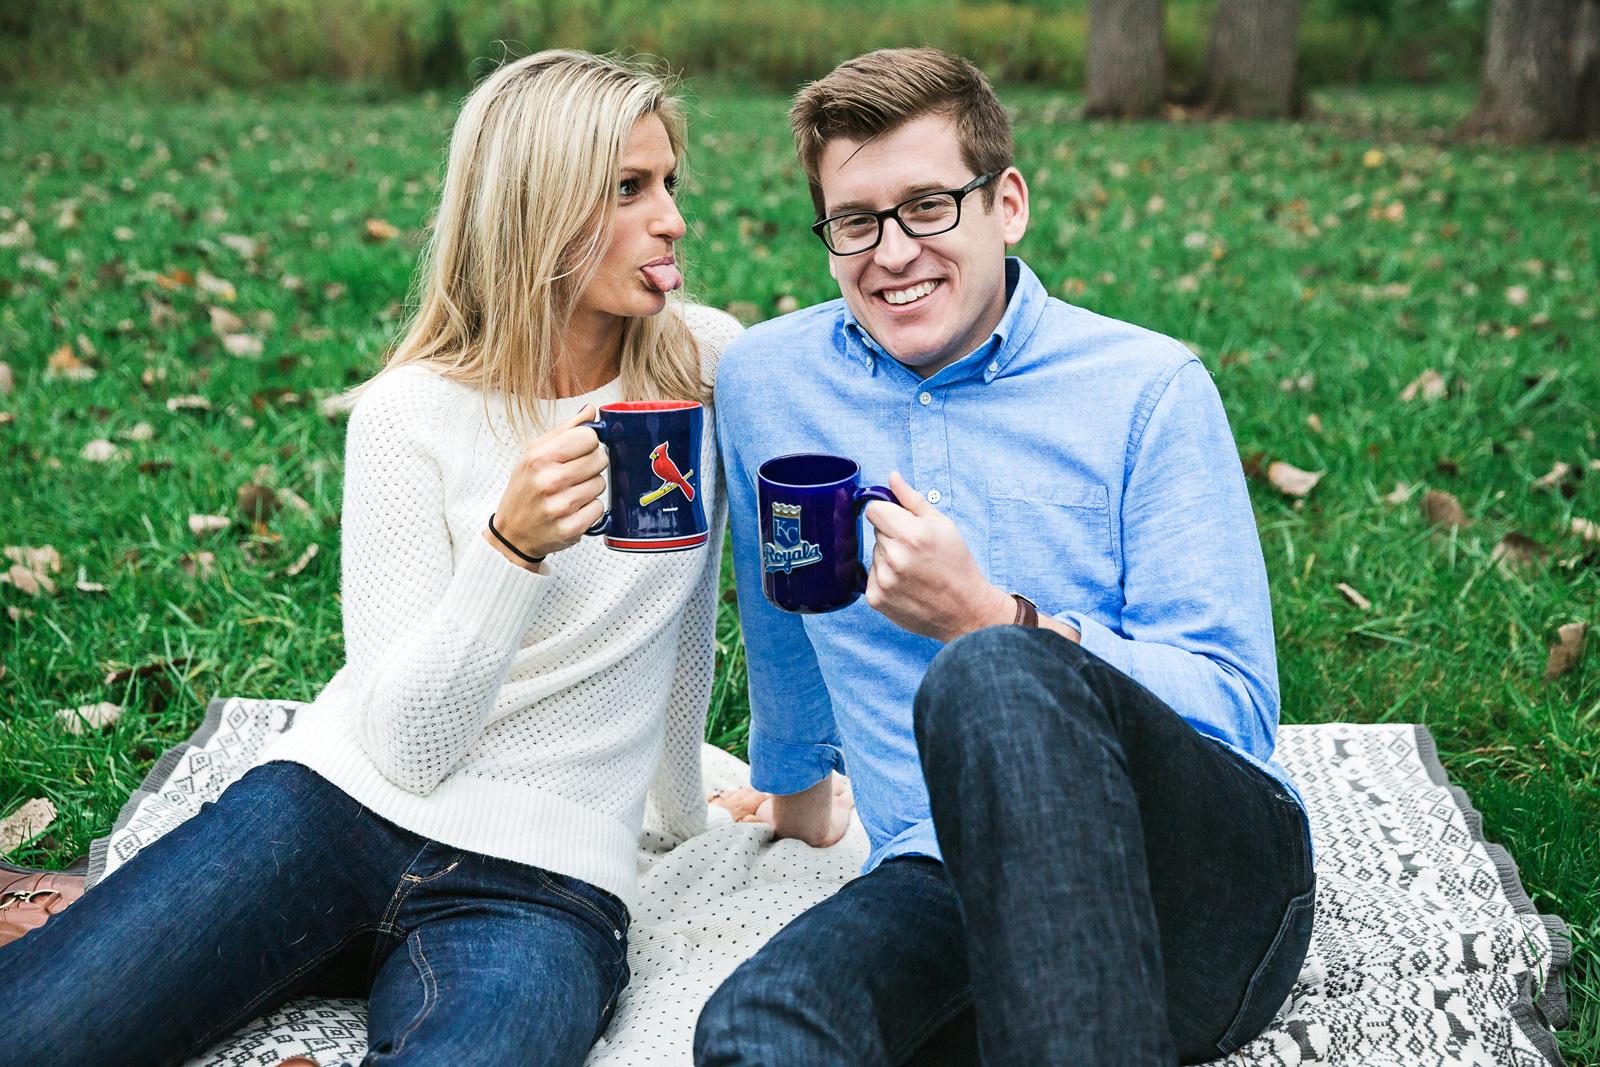 Oldani-Photography-St-Louis-Forest-Park-Dog-Coffee-Mugs-Engagement-Session_20141012_175629.jpg